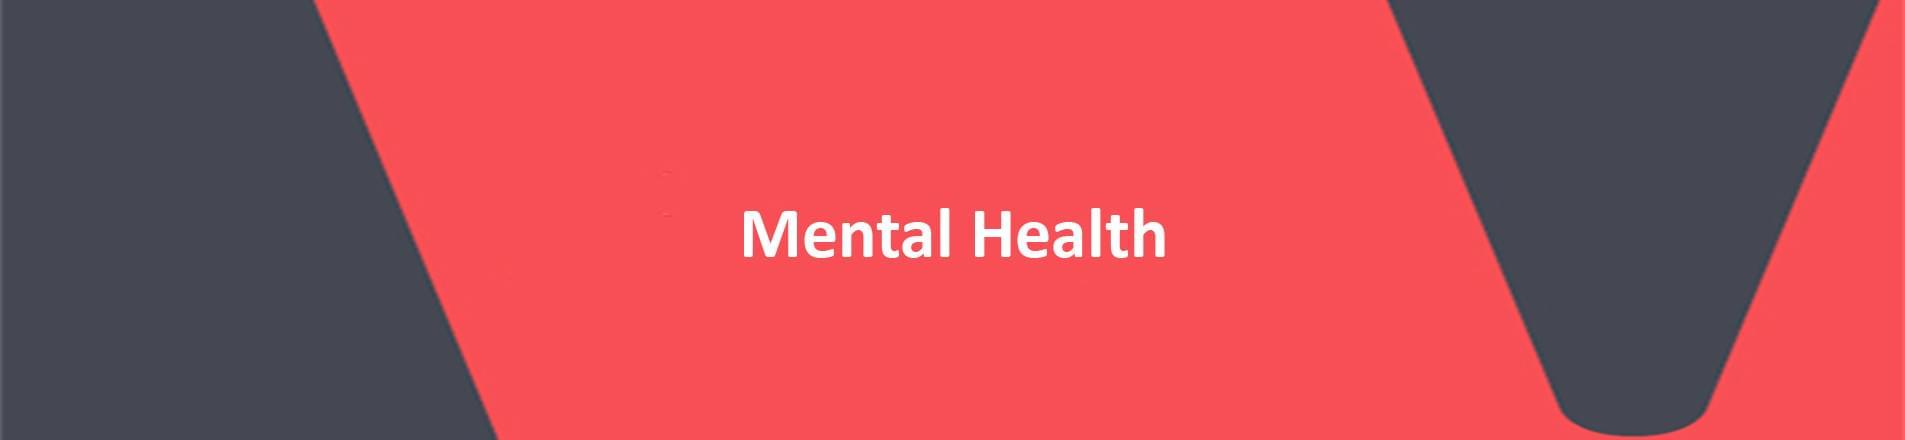 The words 'Mental Heath' on red VERCIDA background